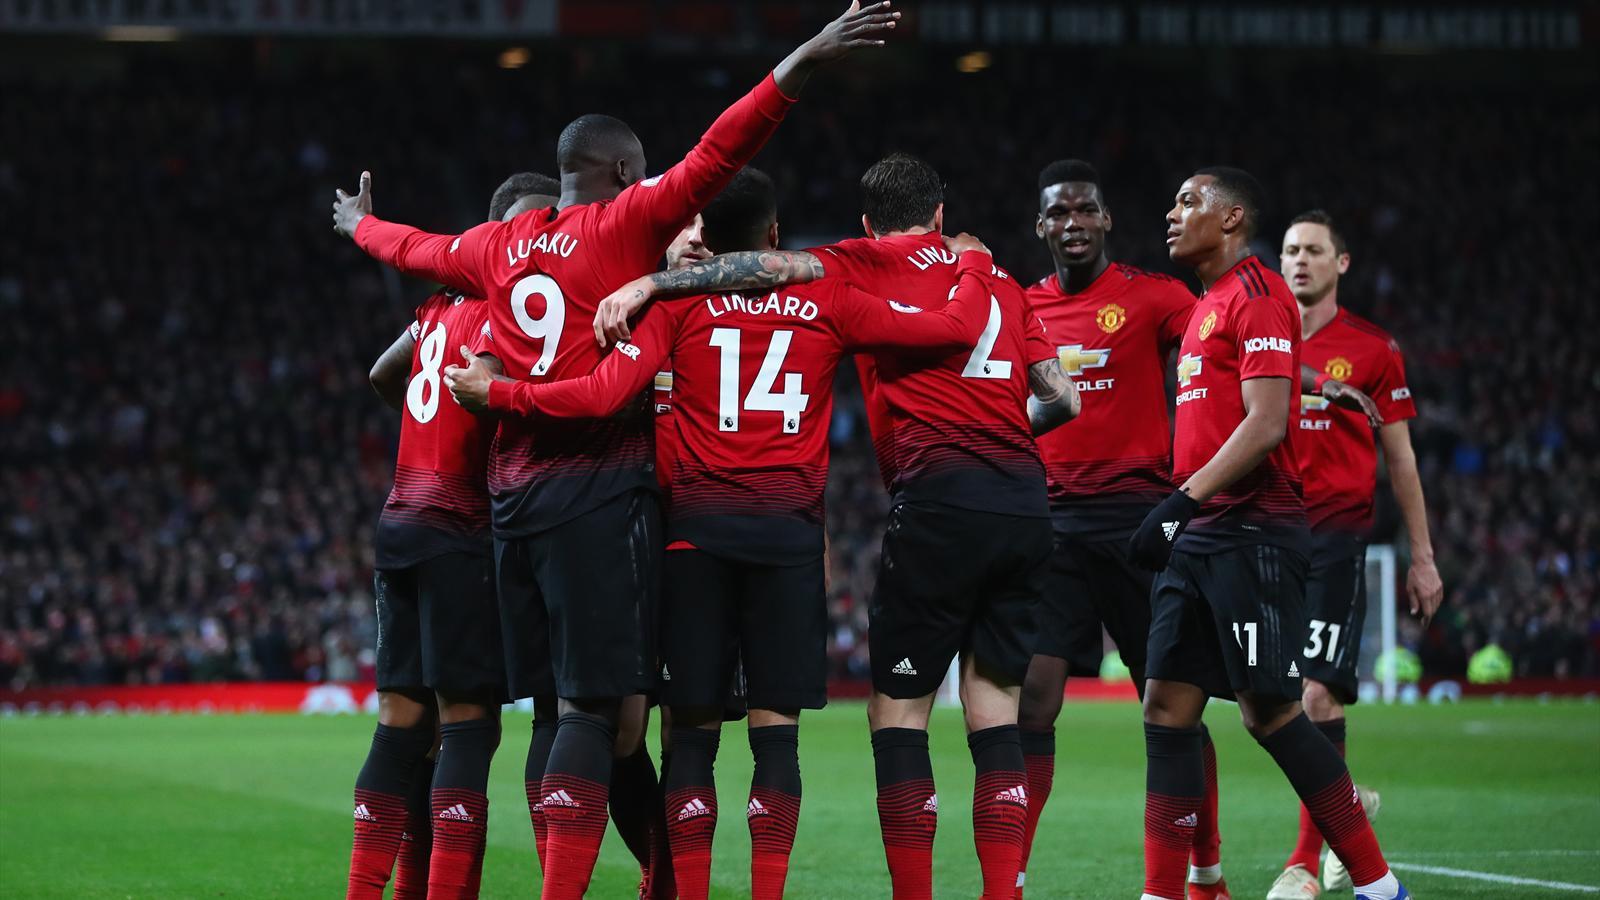 Premier League: For Manchester United Comes The Hardest